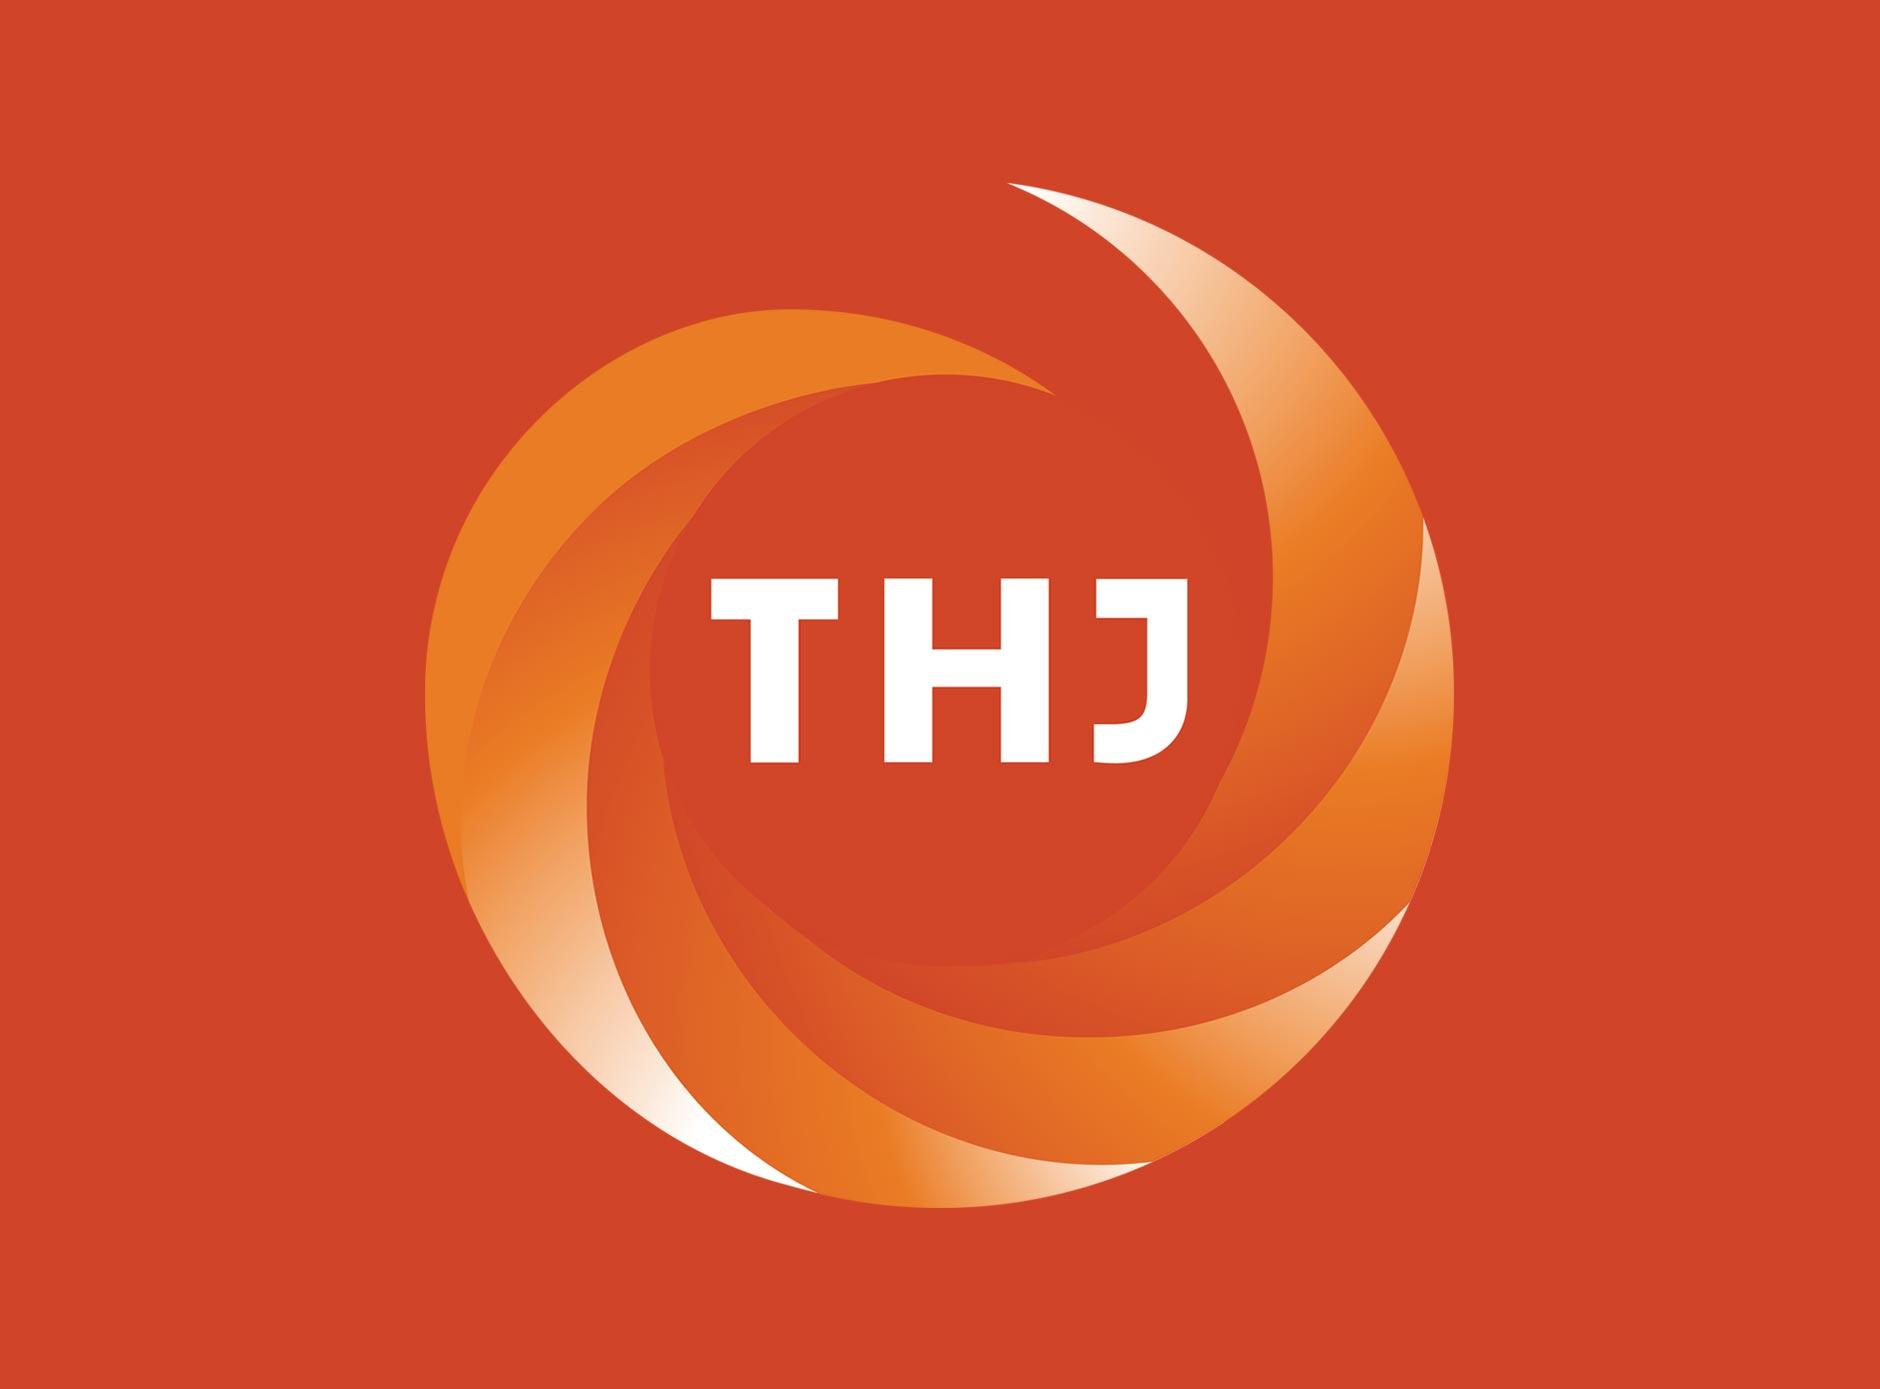 THJ Photography identity